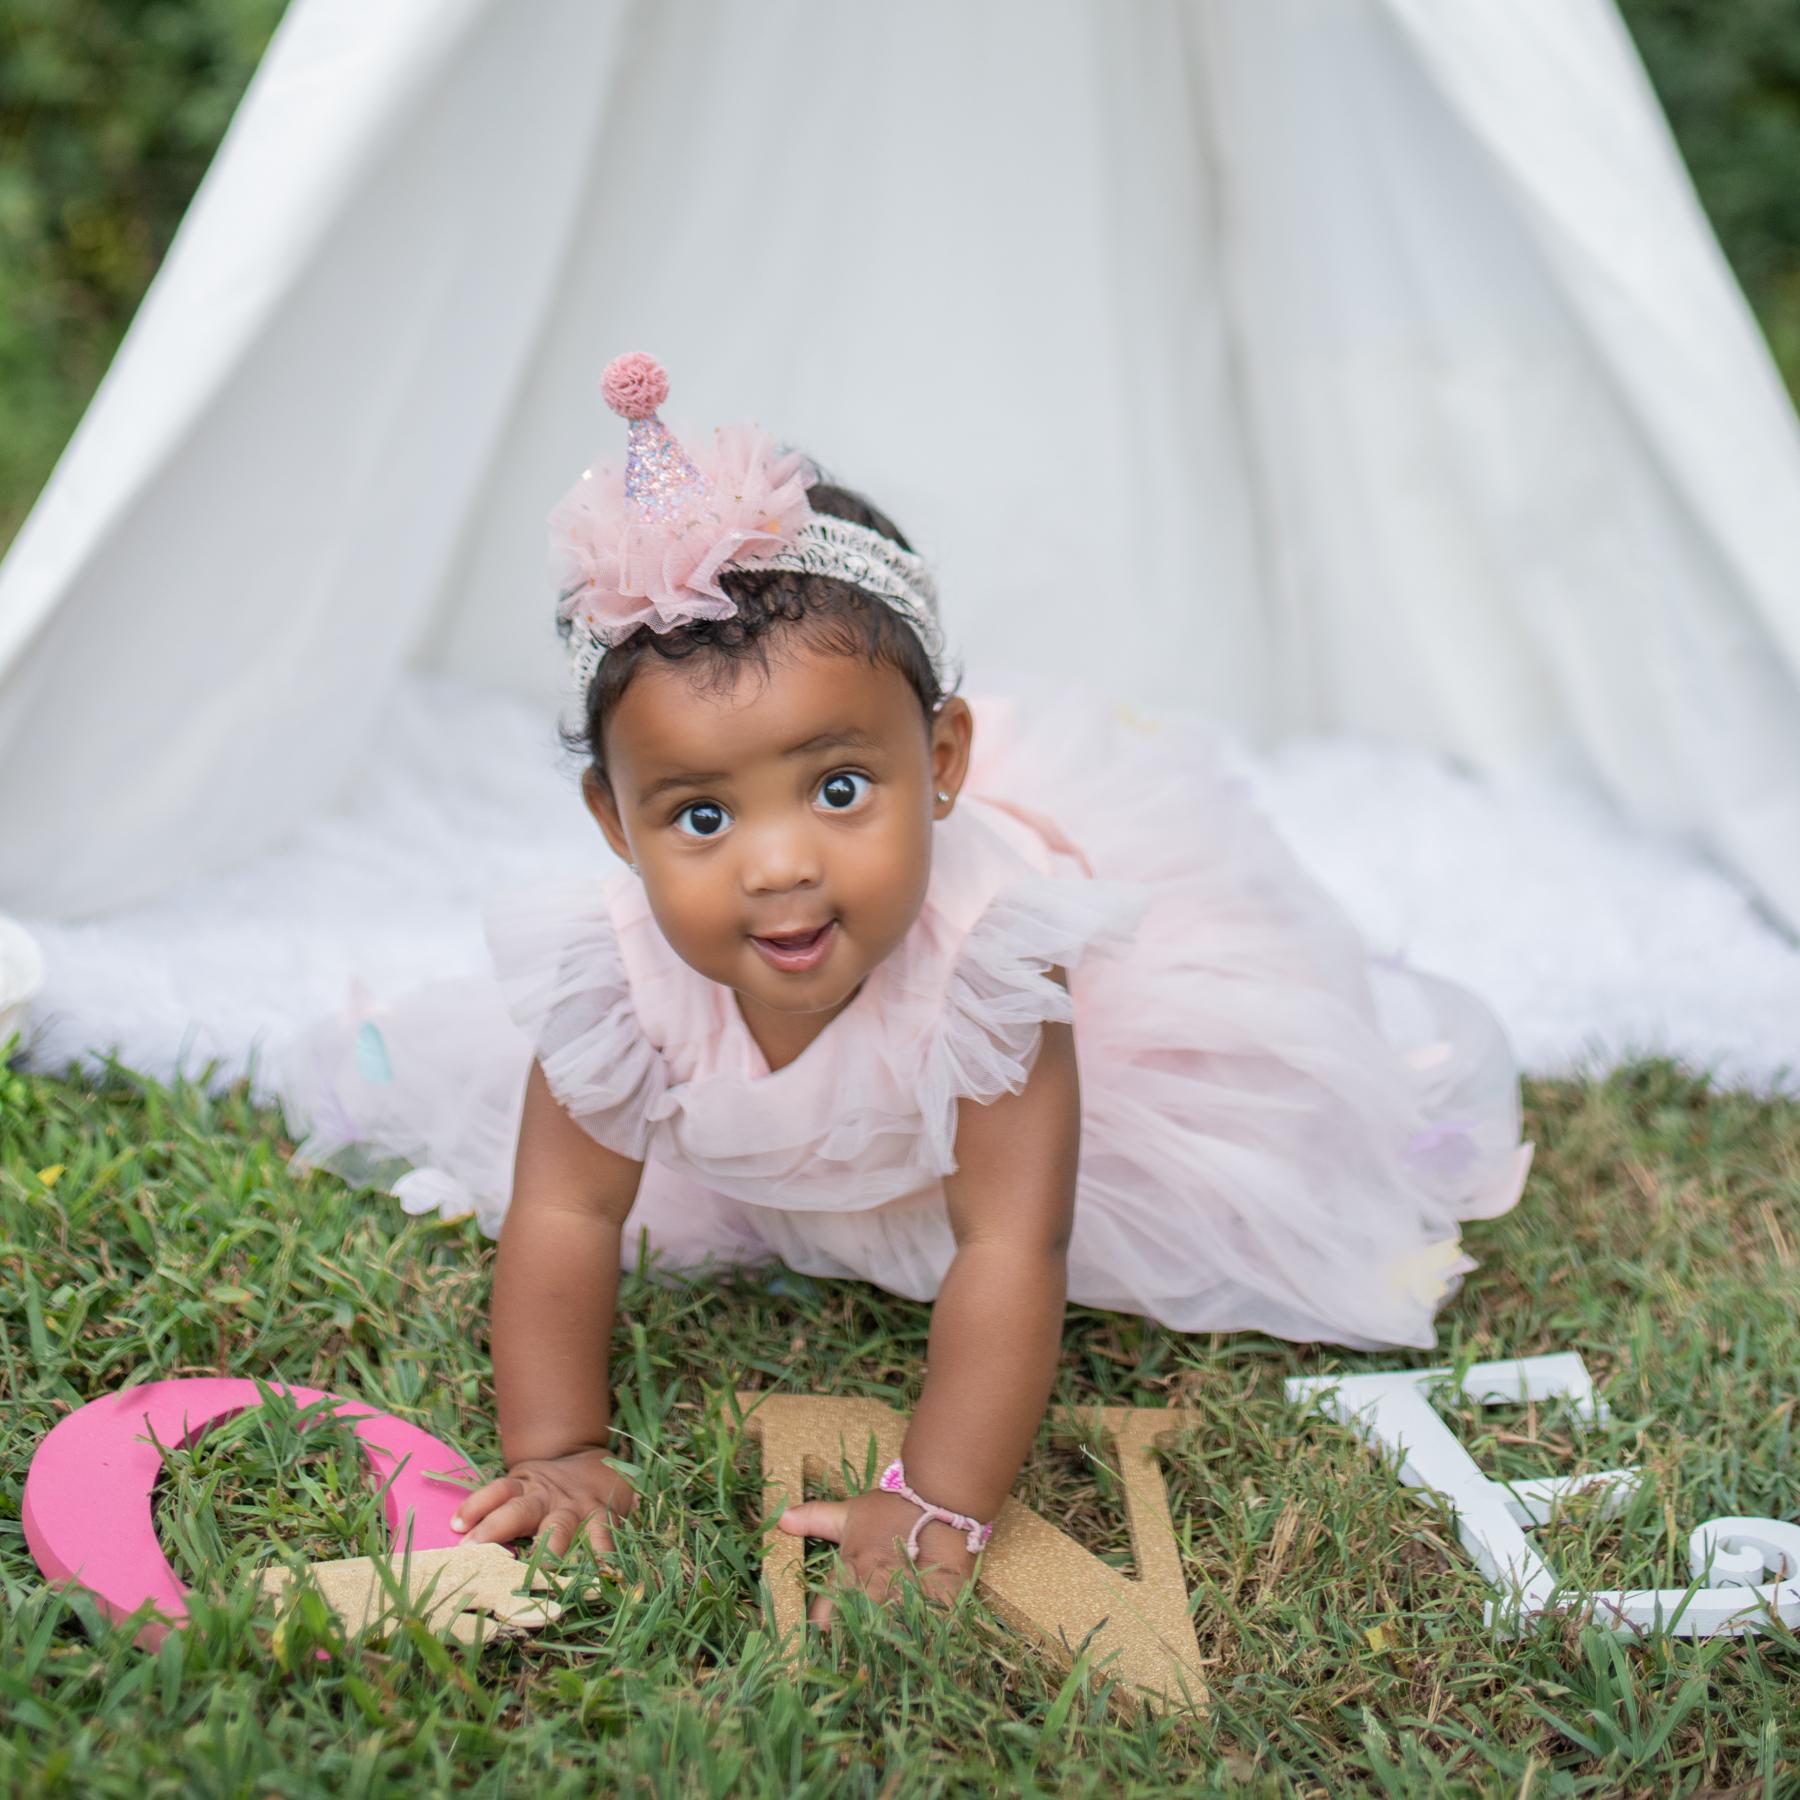 Chattanooga-Birthday-Photography-4.jpg